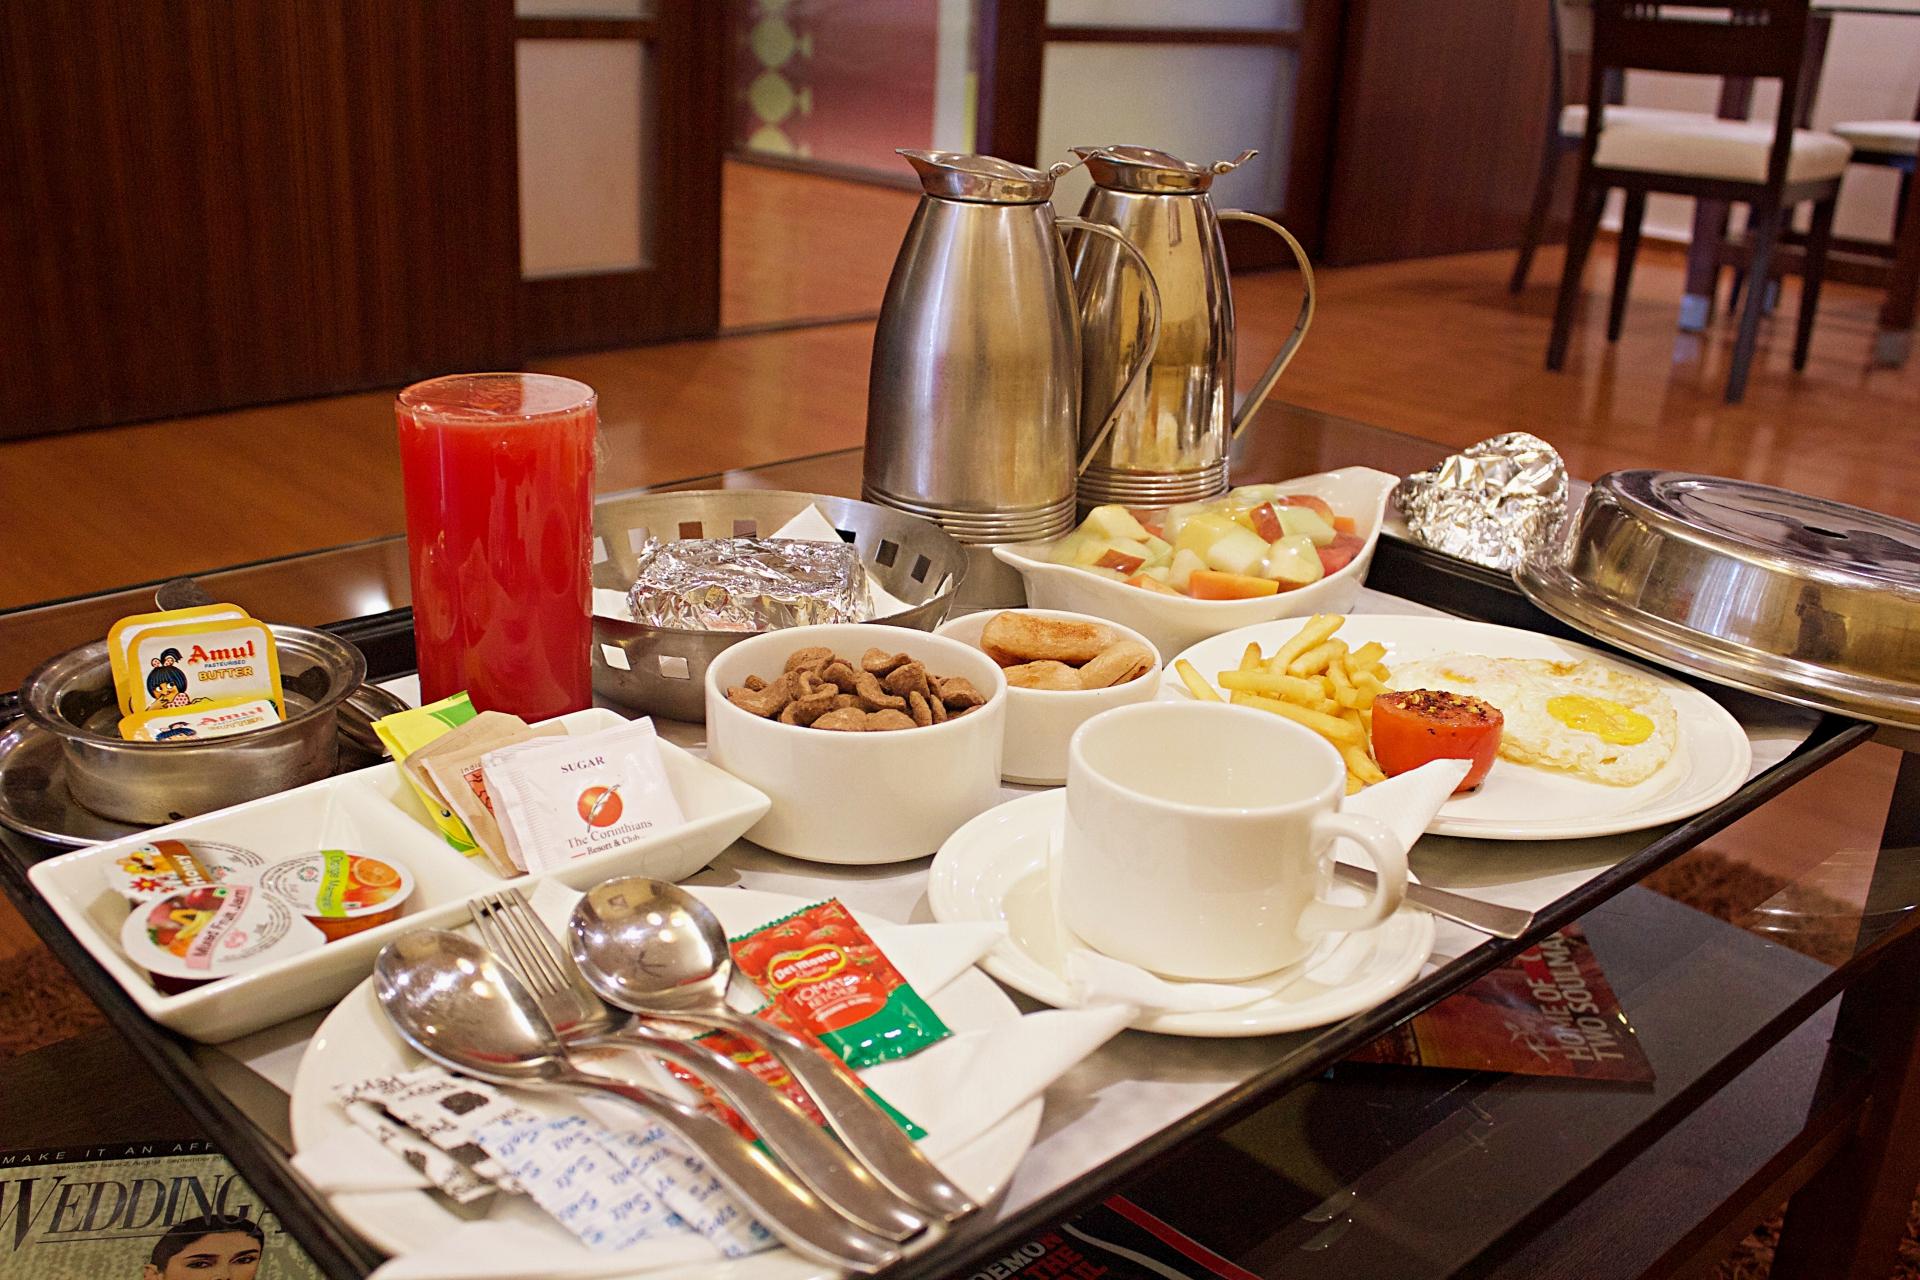 The Corinthians American Breakfast